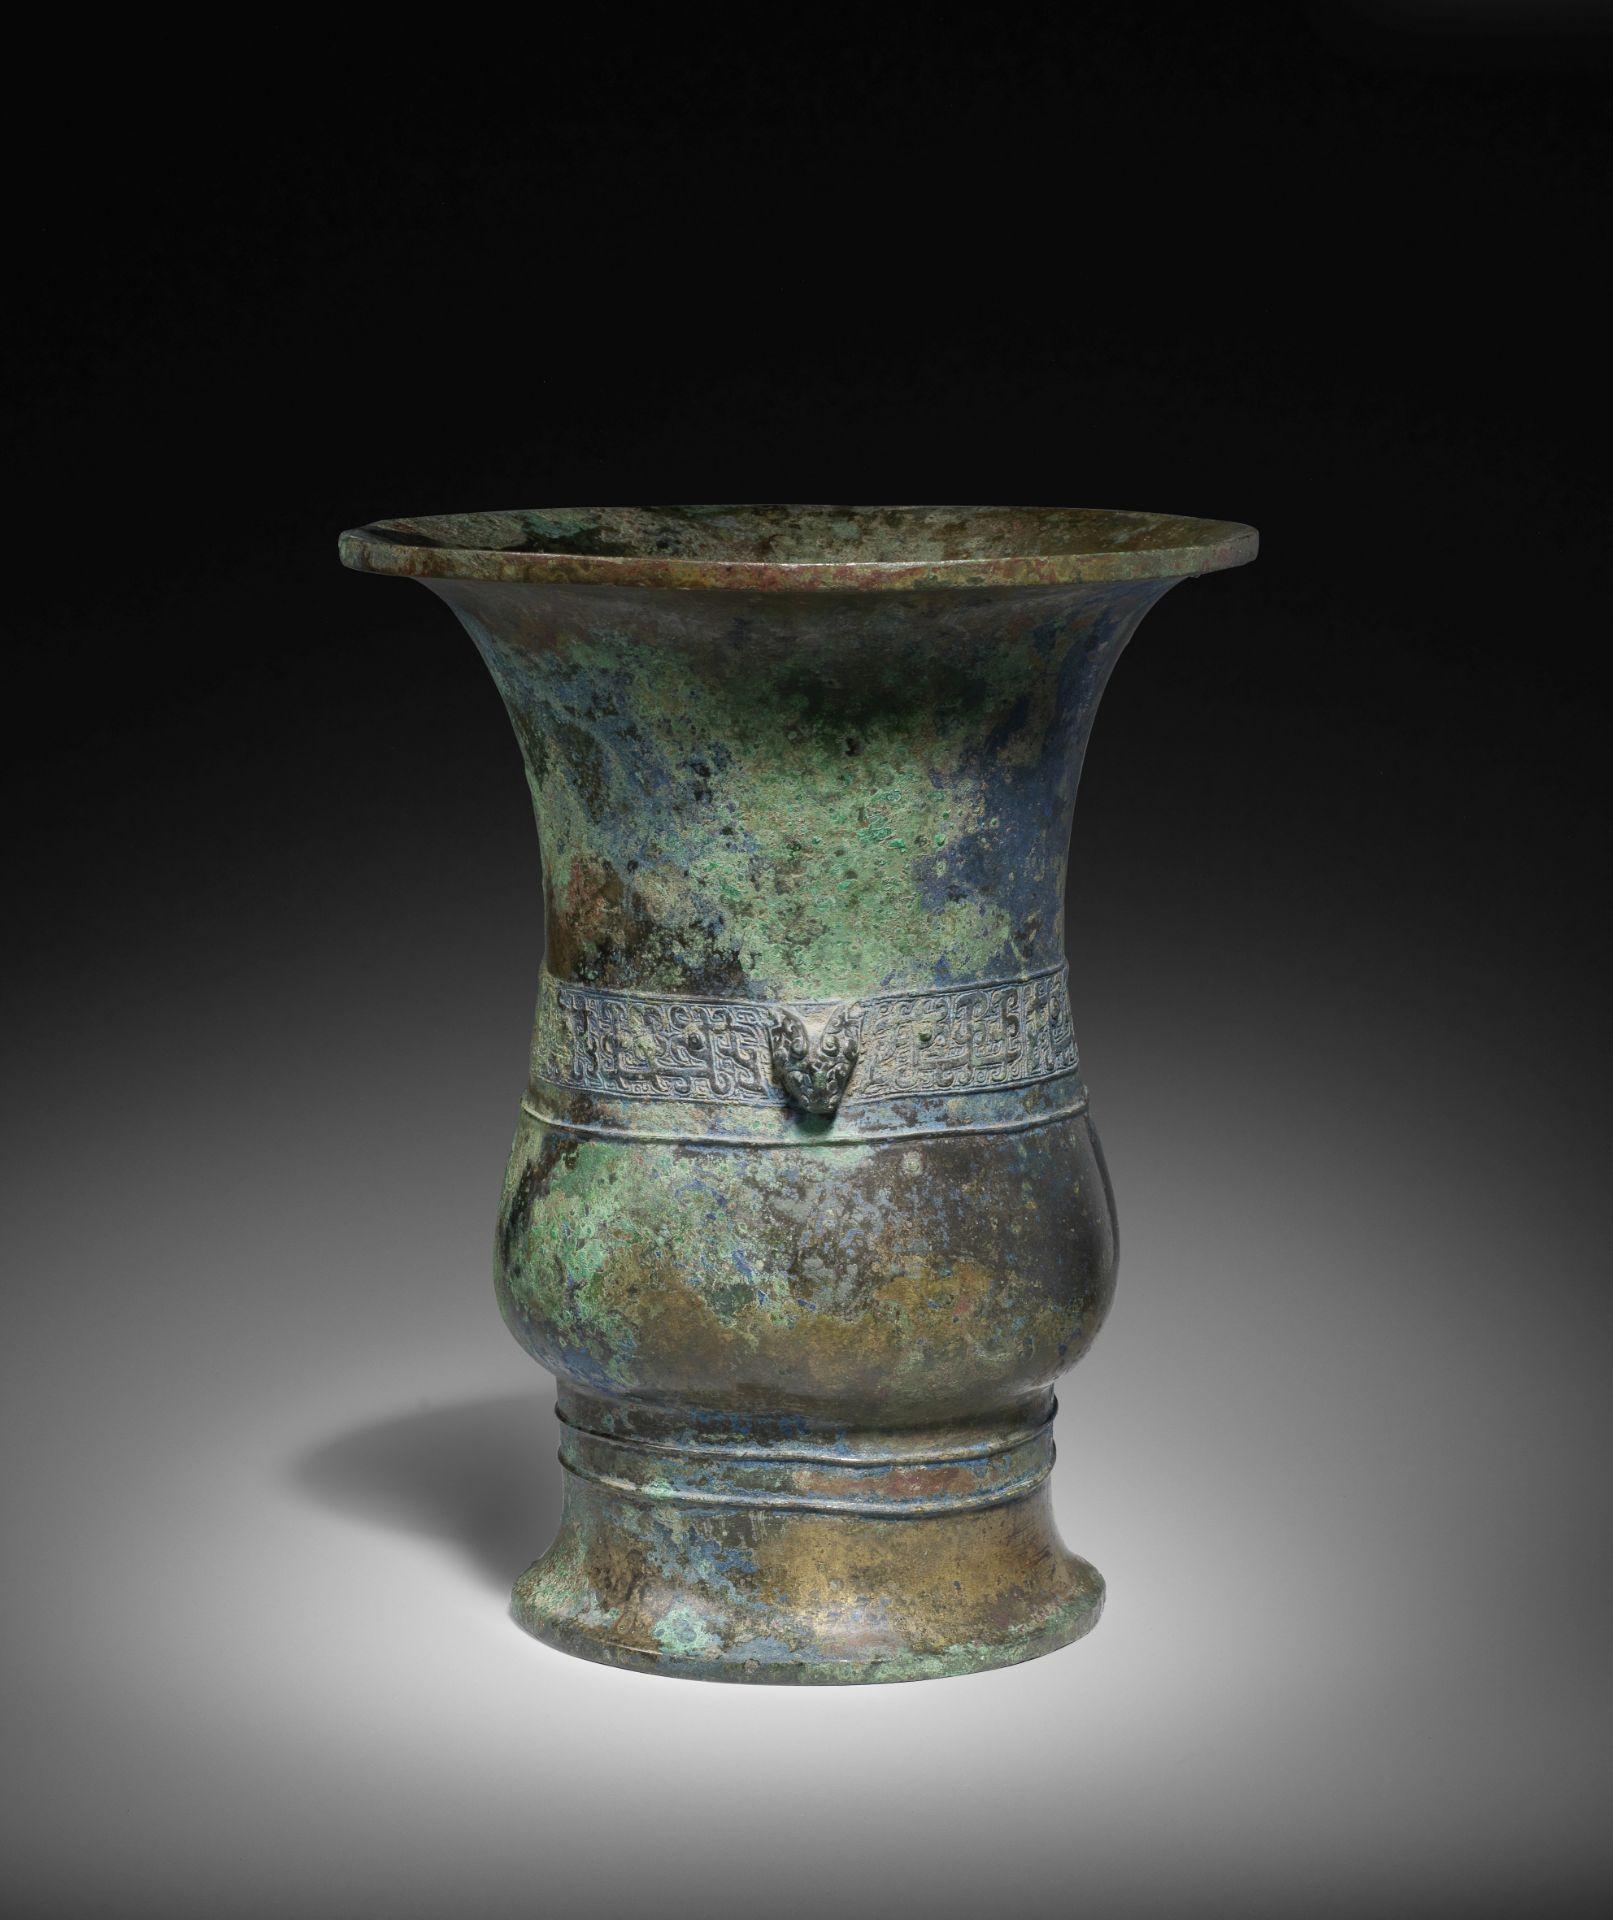 A RARE ARCHAIC BRONZE RITUAL VESSEL, ZHI Early Western Zhou Dynasty, 11th/10th century BC